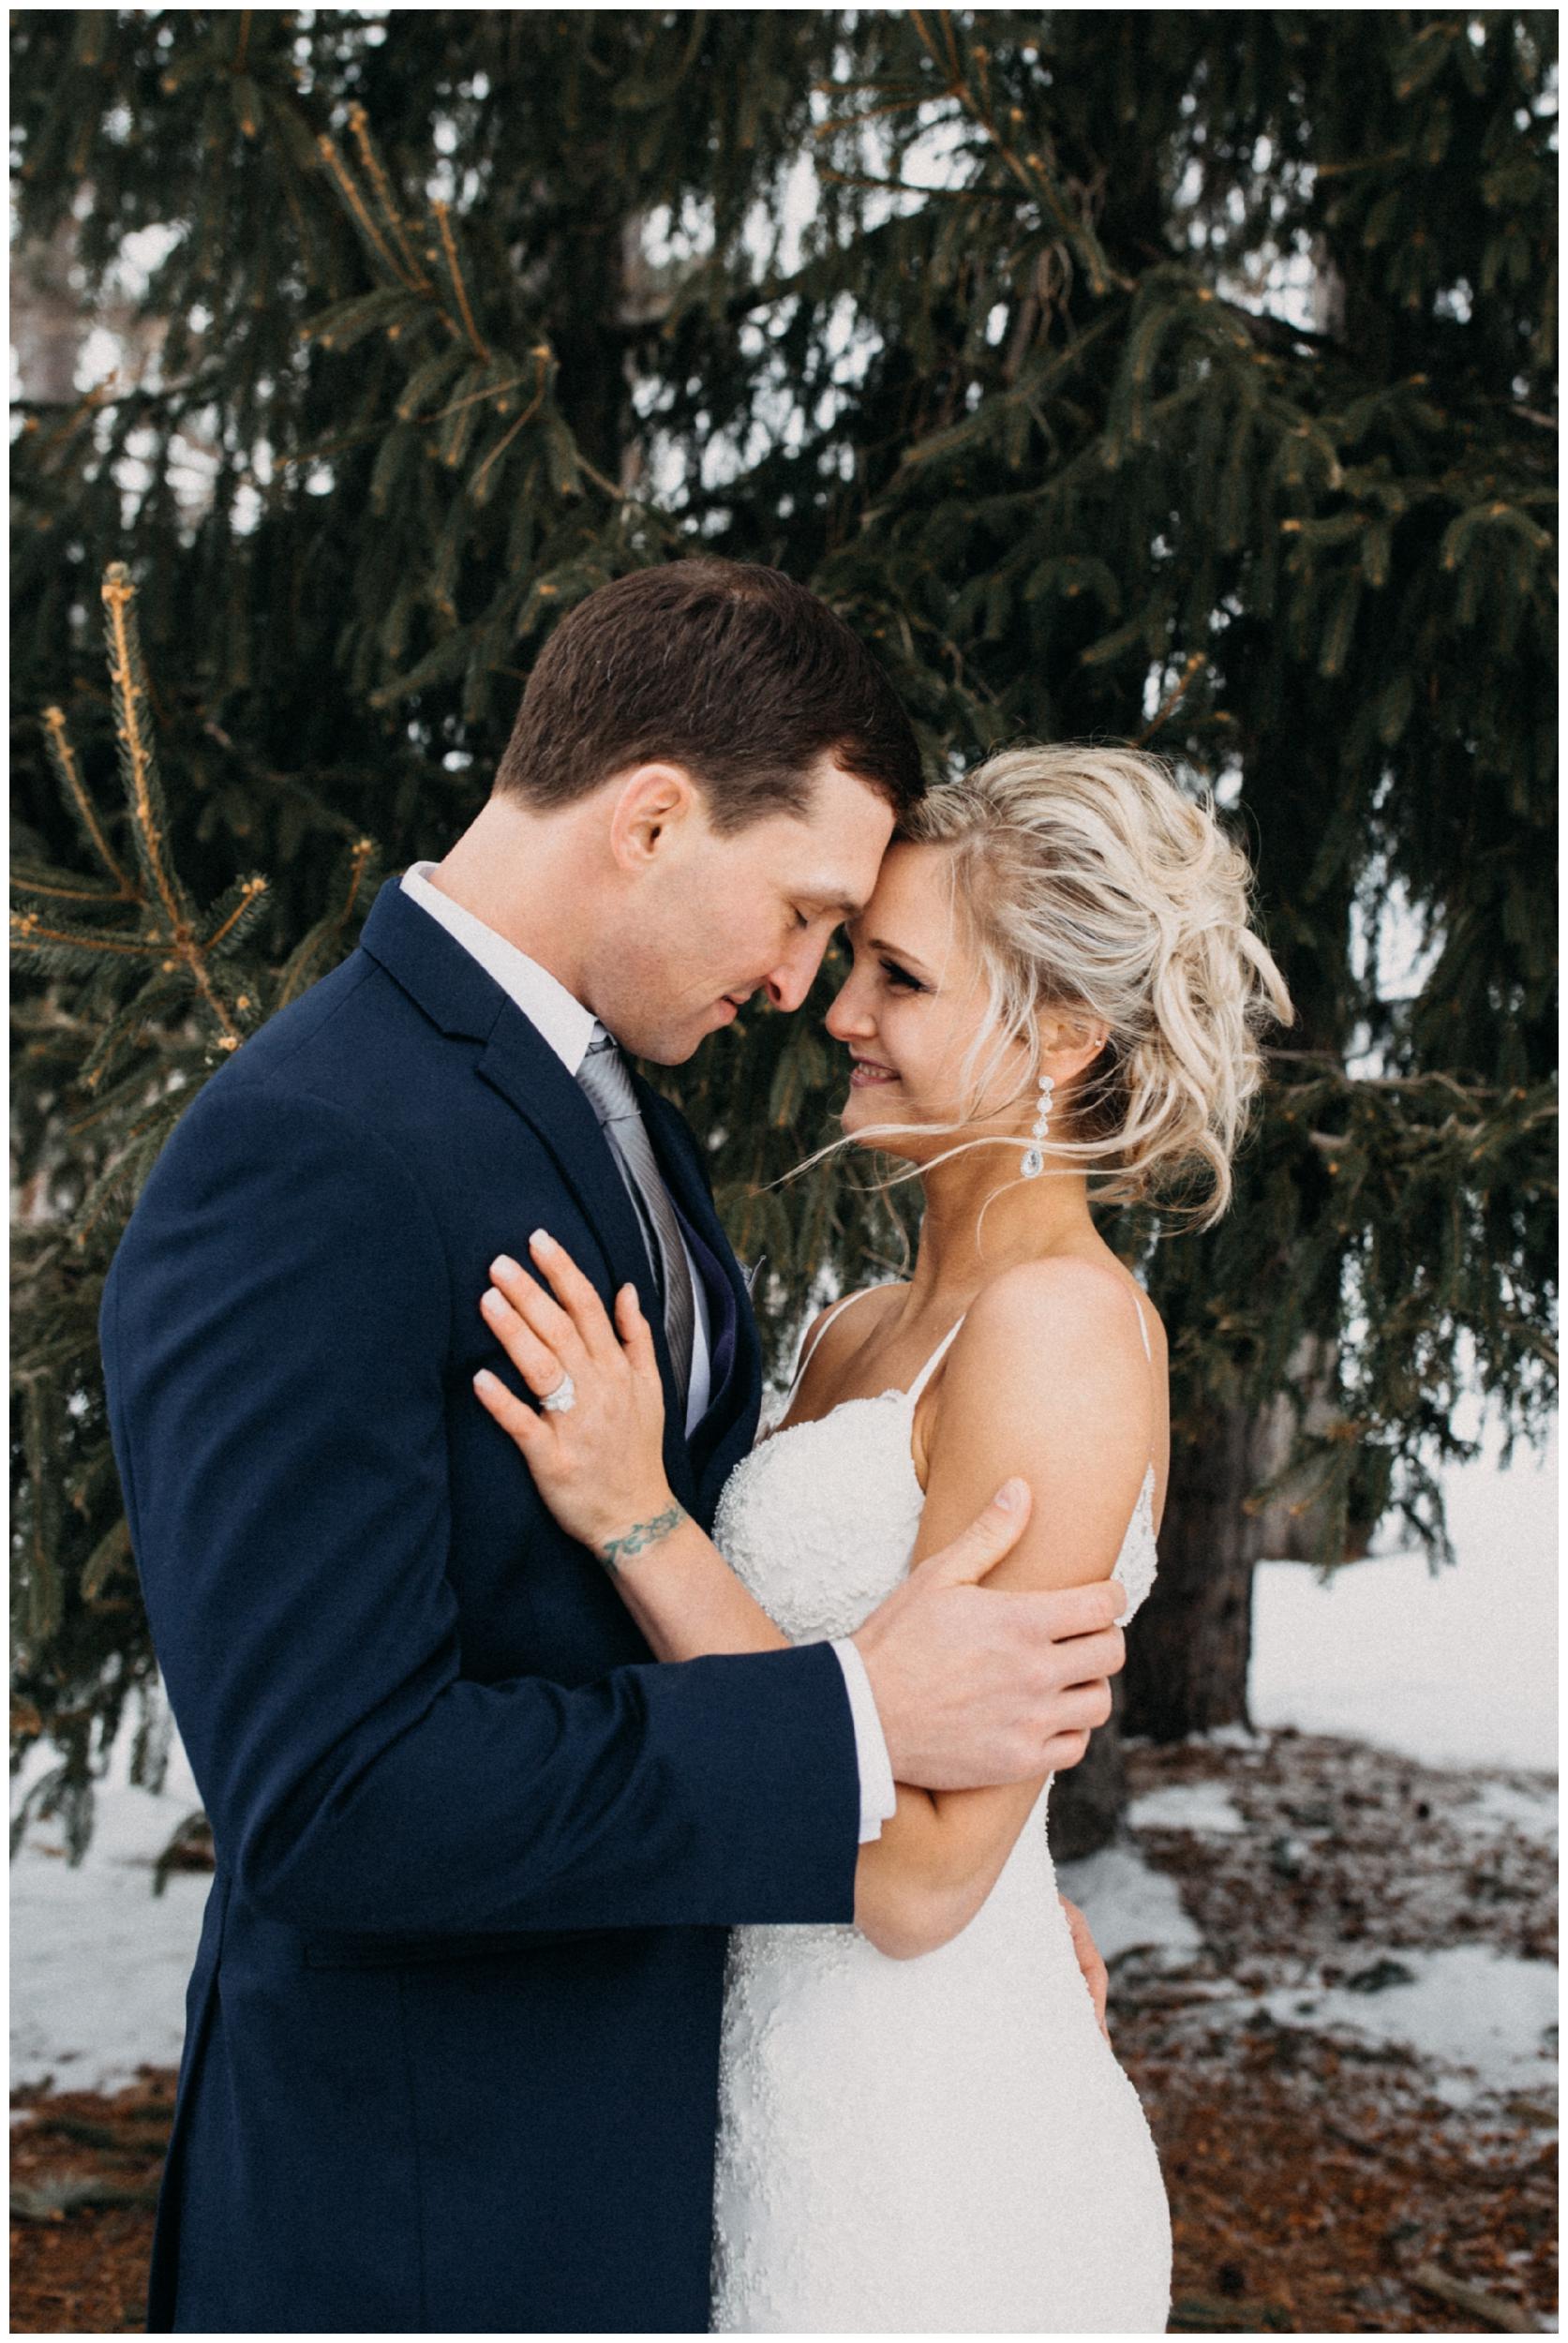 Romantic winter wedding at Cragun's resort in Brainerd Minnesota